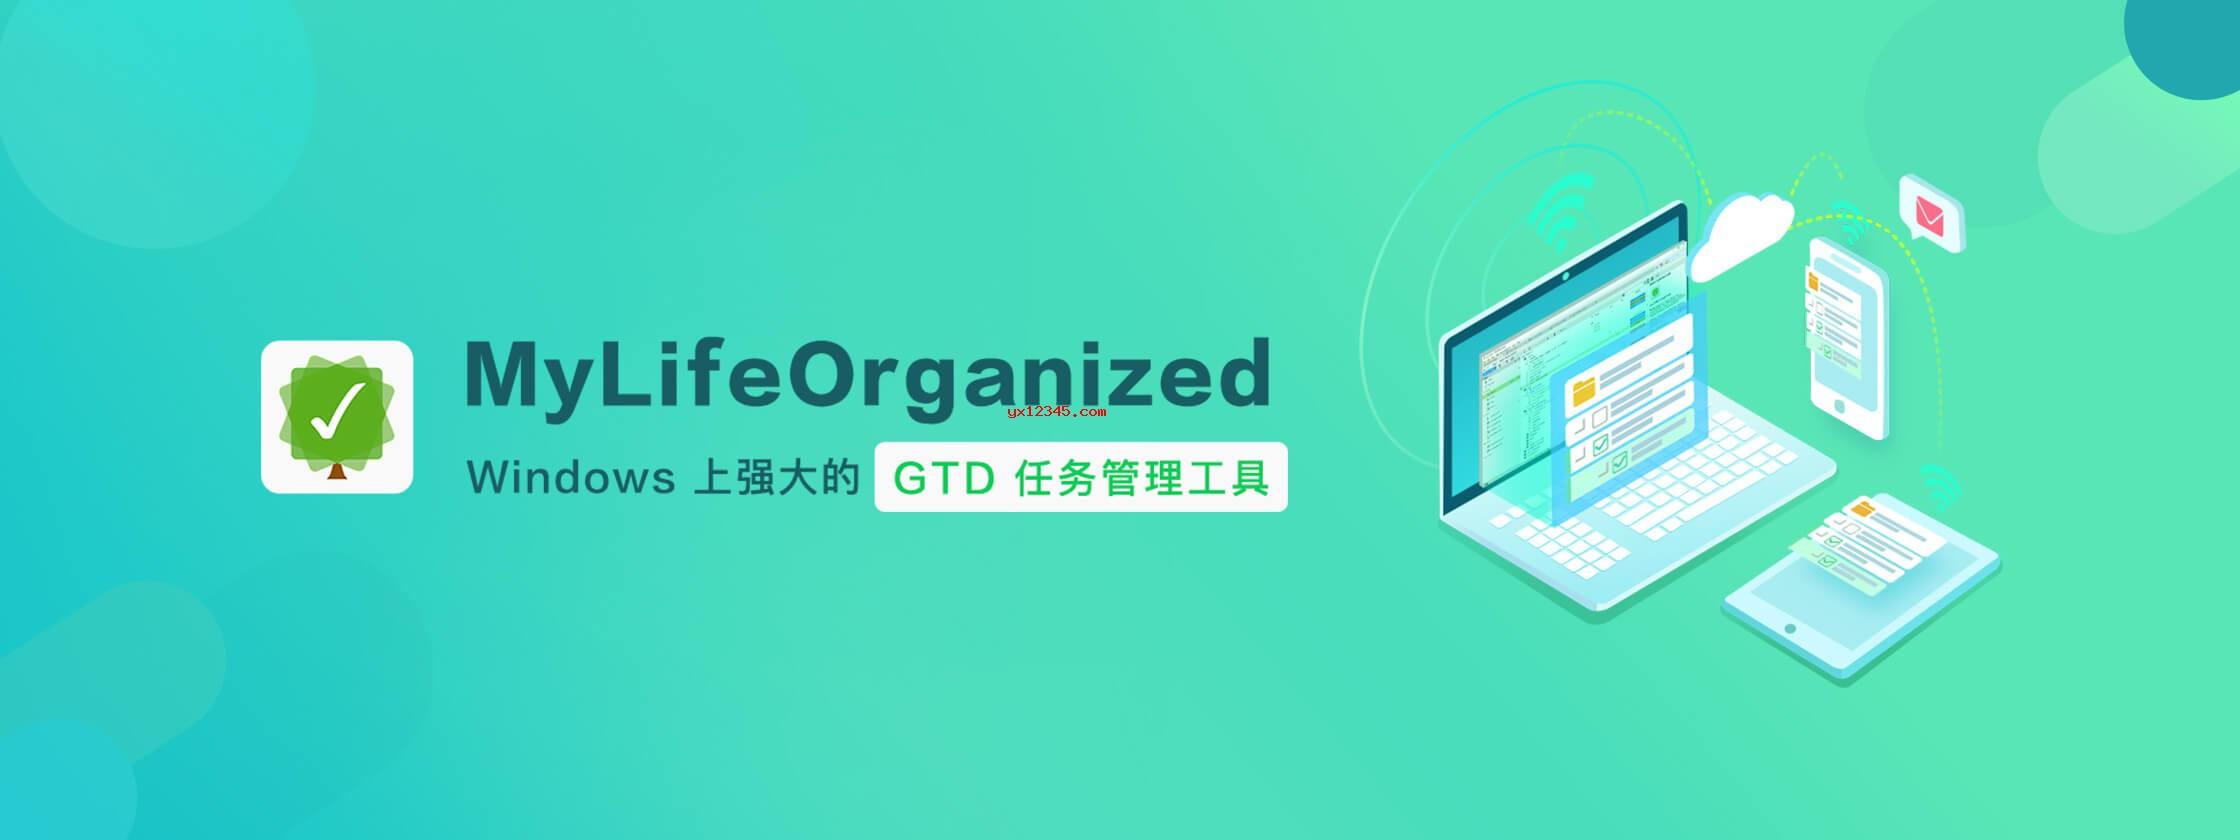 mylifeorganized软件海报